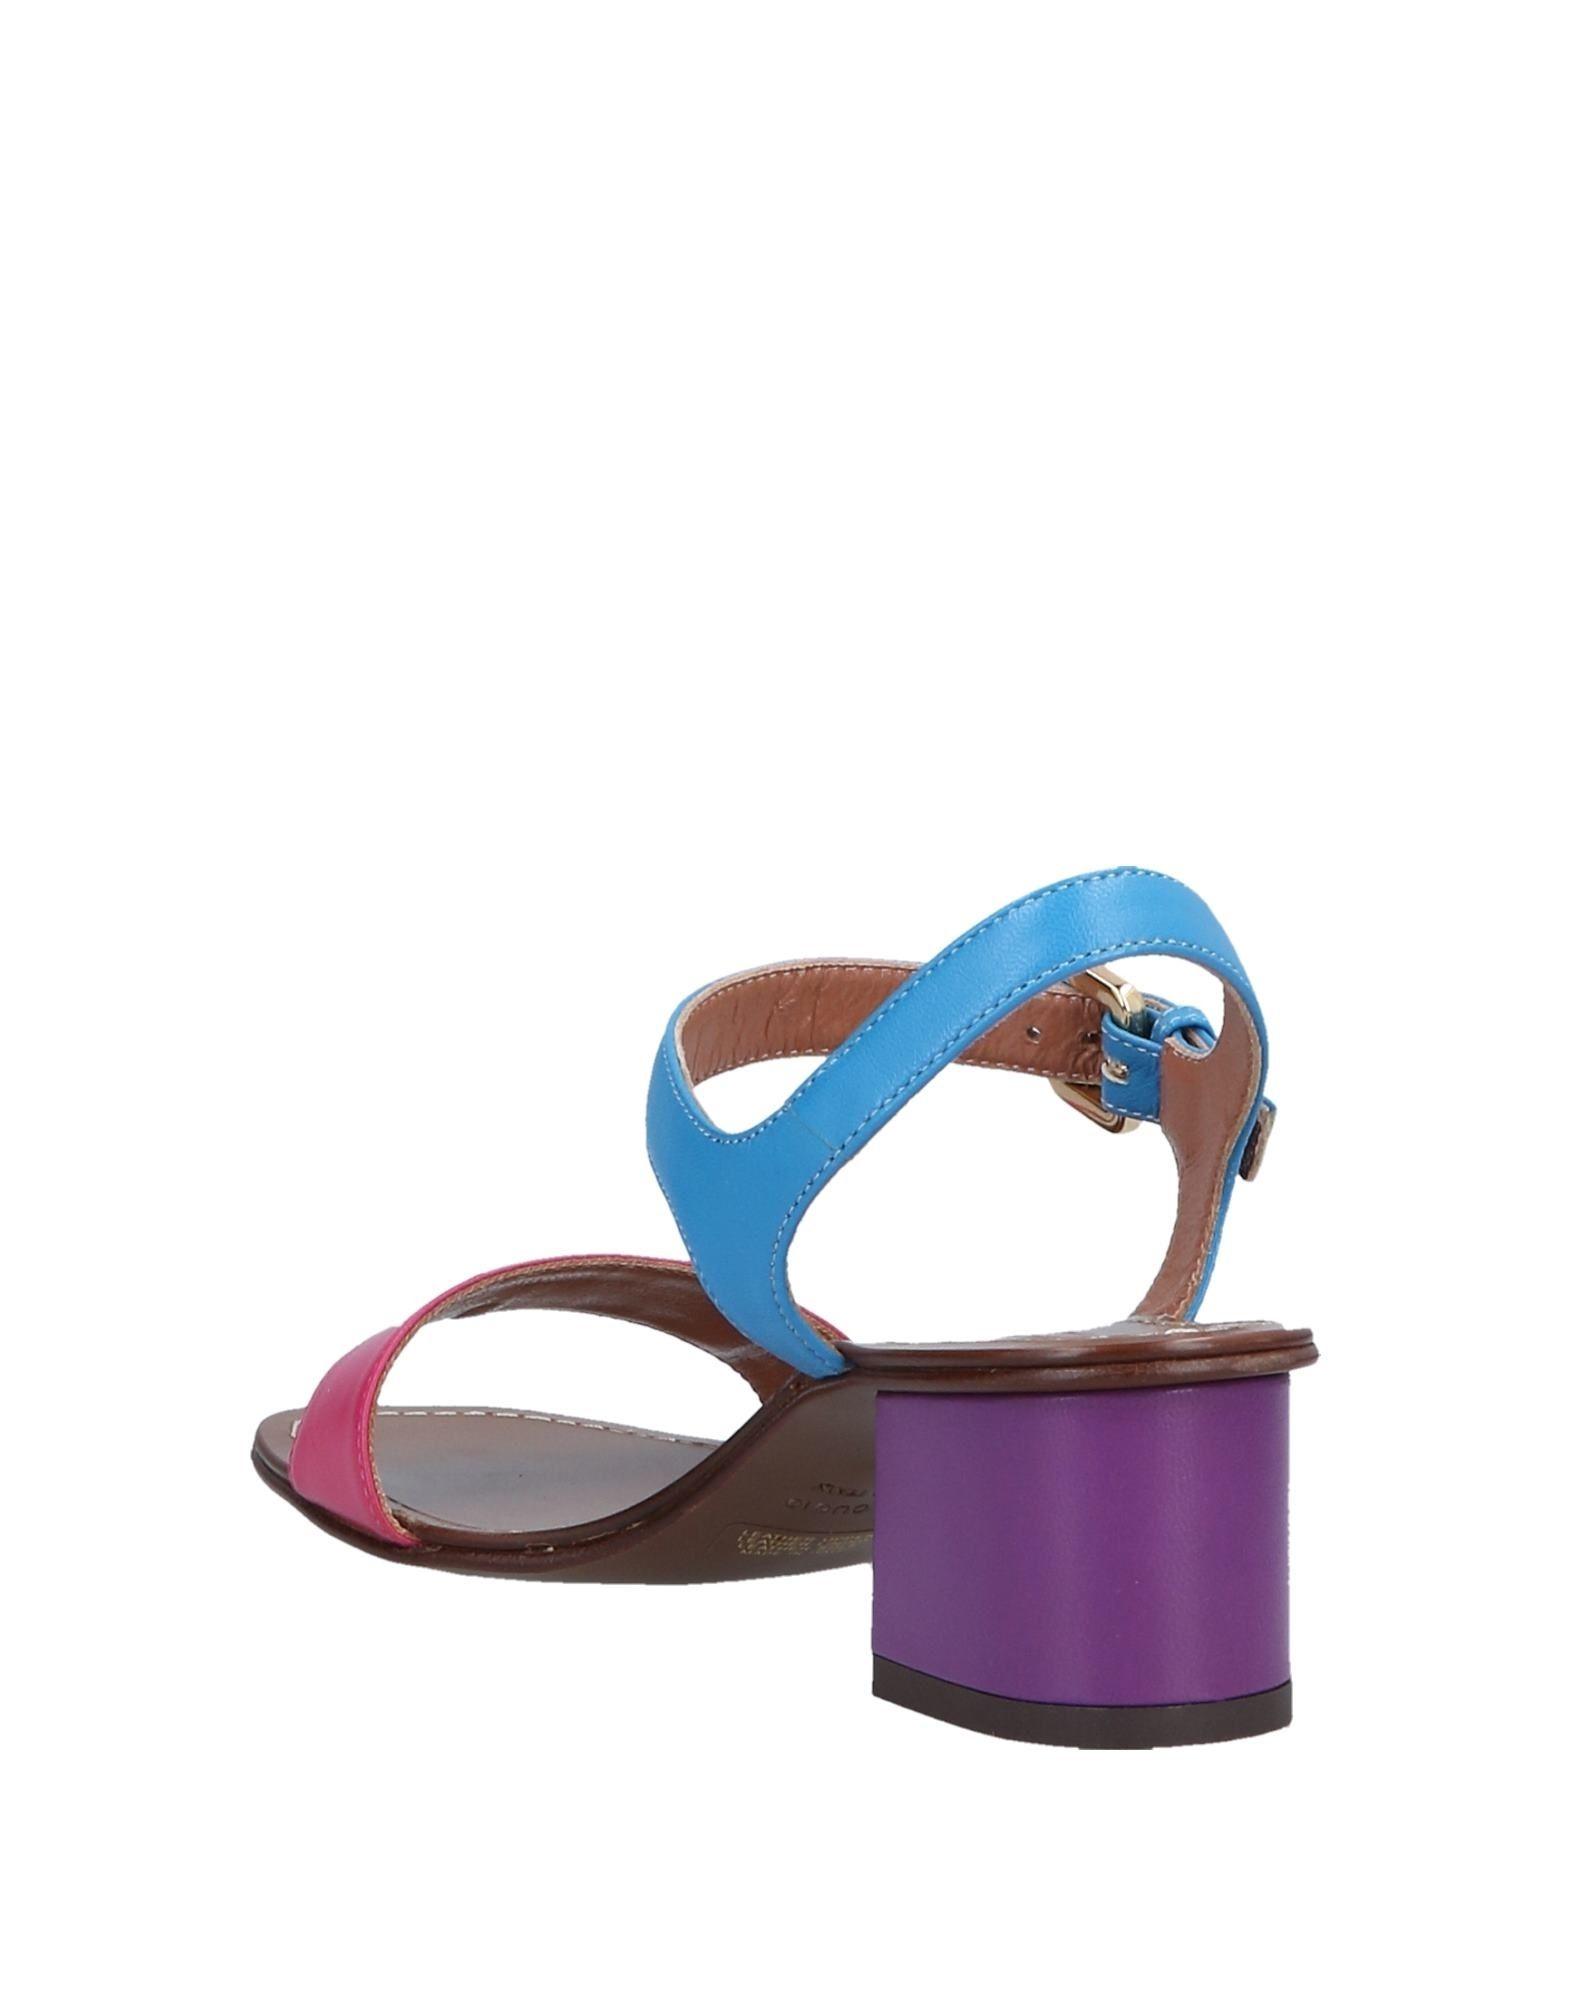 L' Autre Chose Sandalen Damen Schuhe  11303102FTGut aussehende strapazierfähige Schuhe Damen bbf4d5